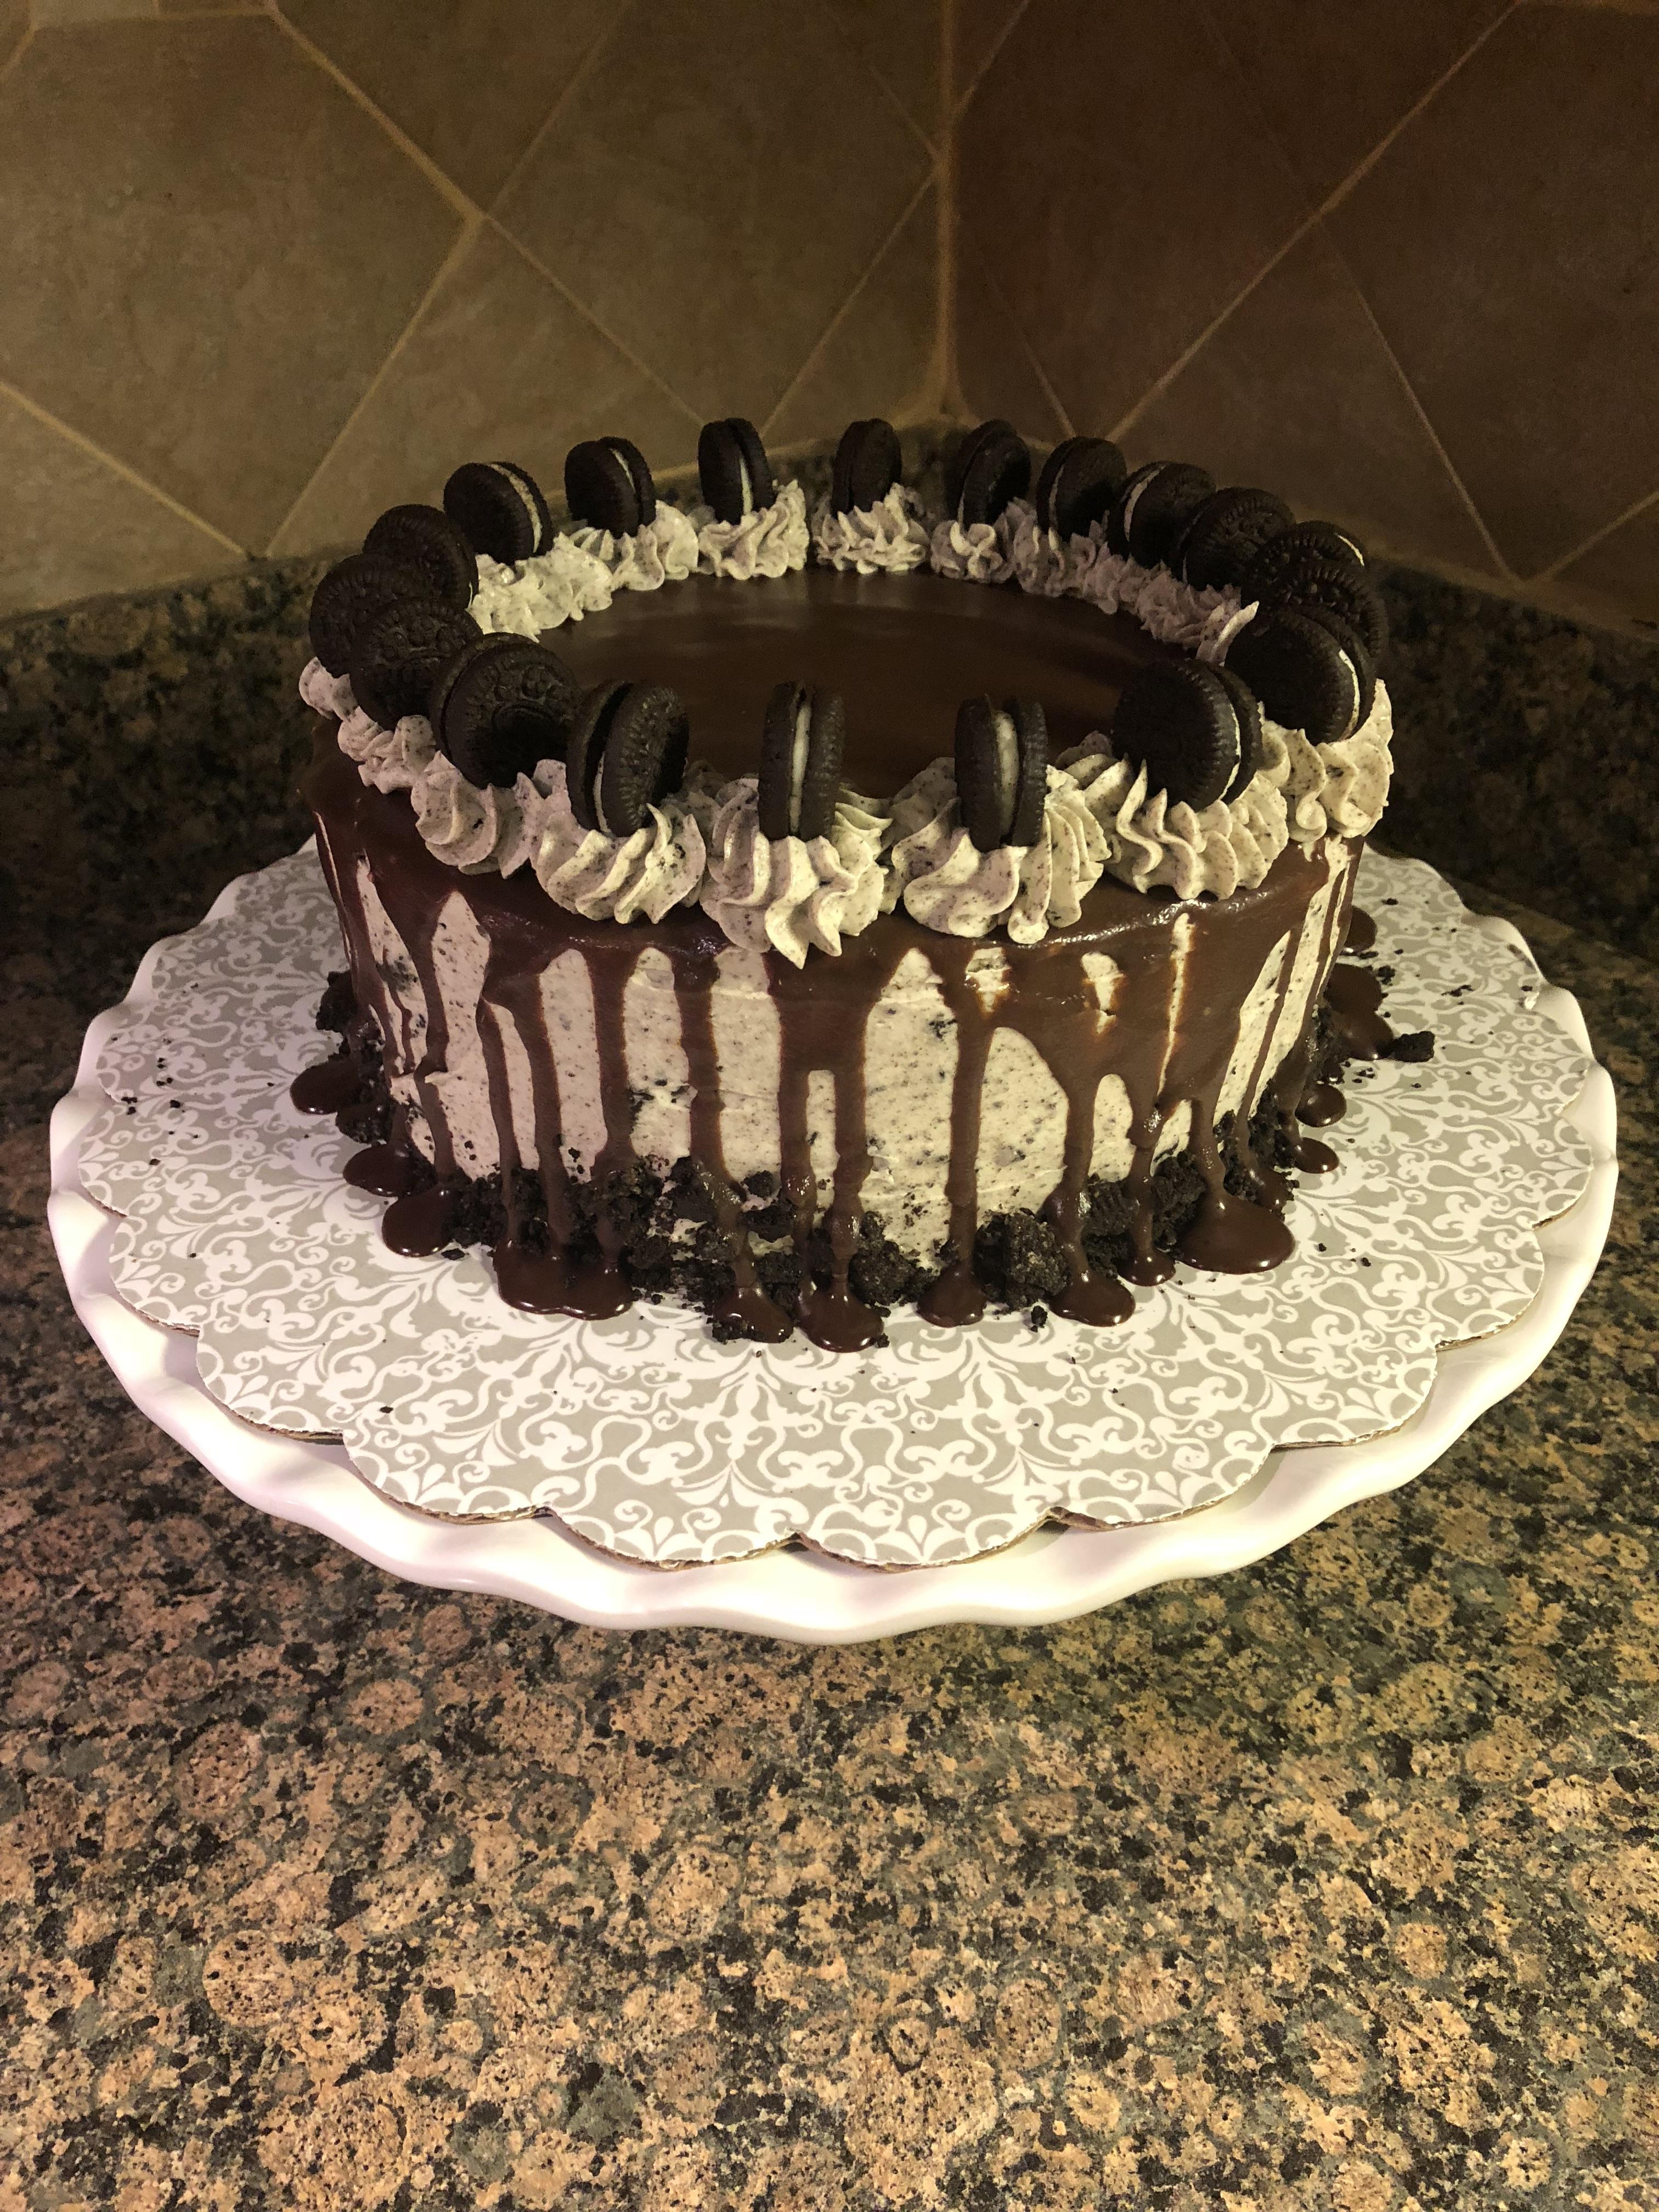 Fantastic Cookies And Cream Cake Bead Yarn Spatula Funny Birthday Cards Online Hendilapandamsfinfo